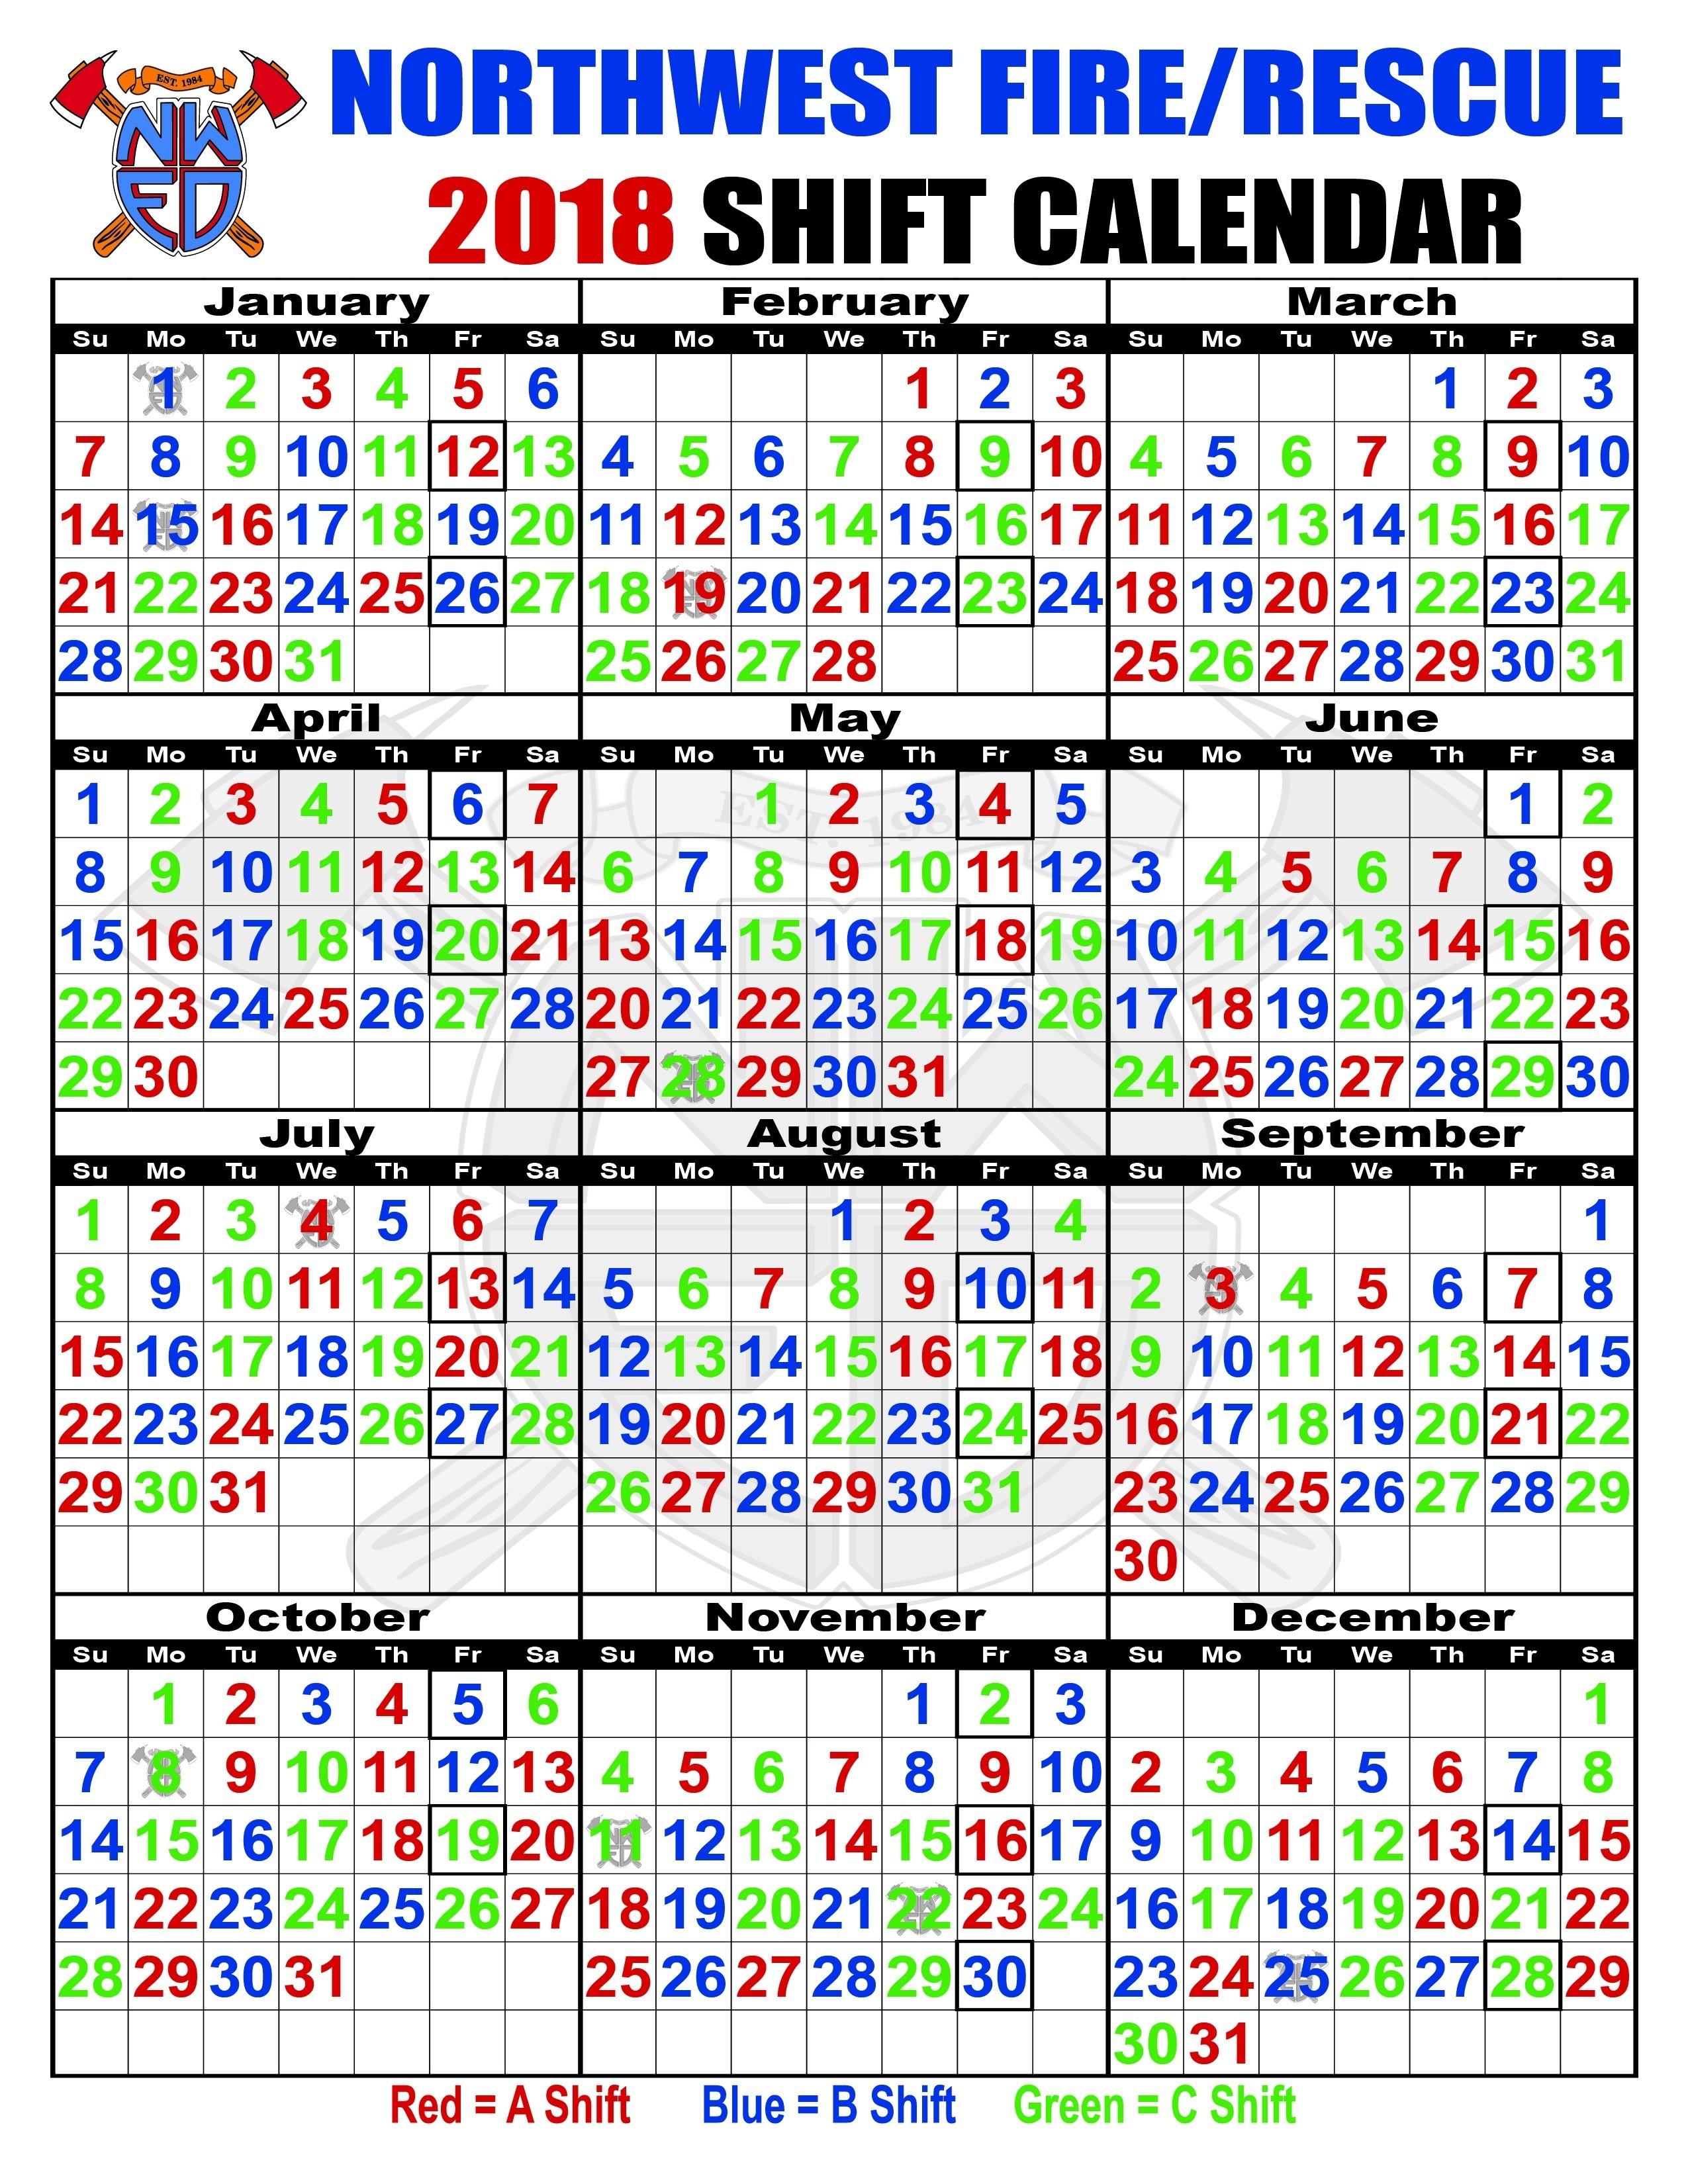 Abc Firefighter Shift Calendar 2018 Printed For Cost-Free-Firefighter Shift Calendar Template